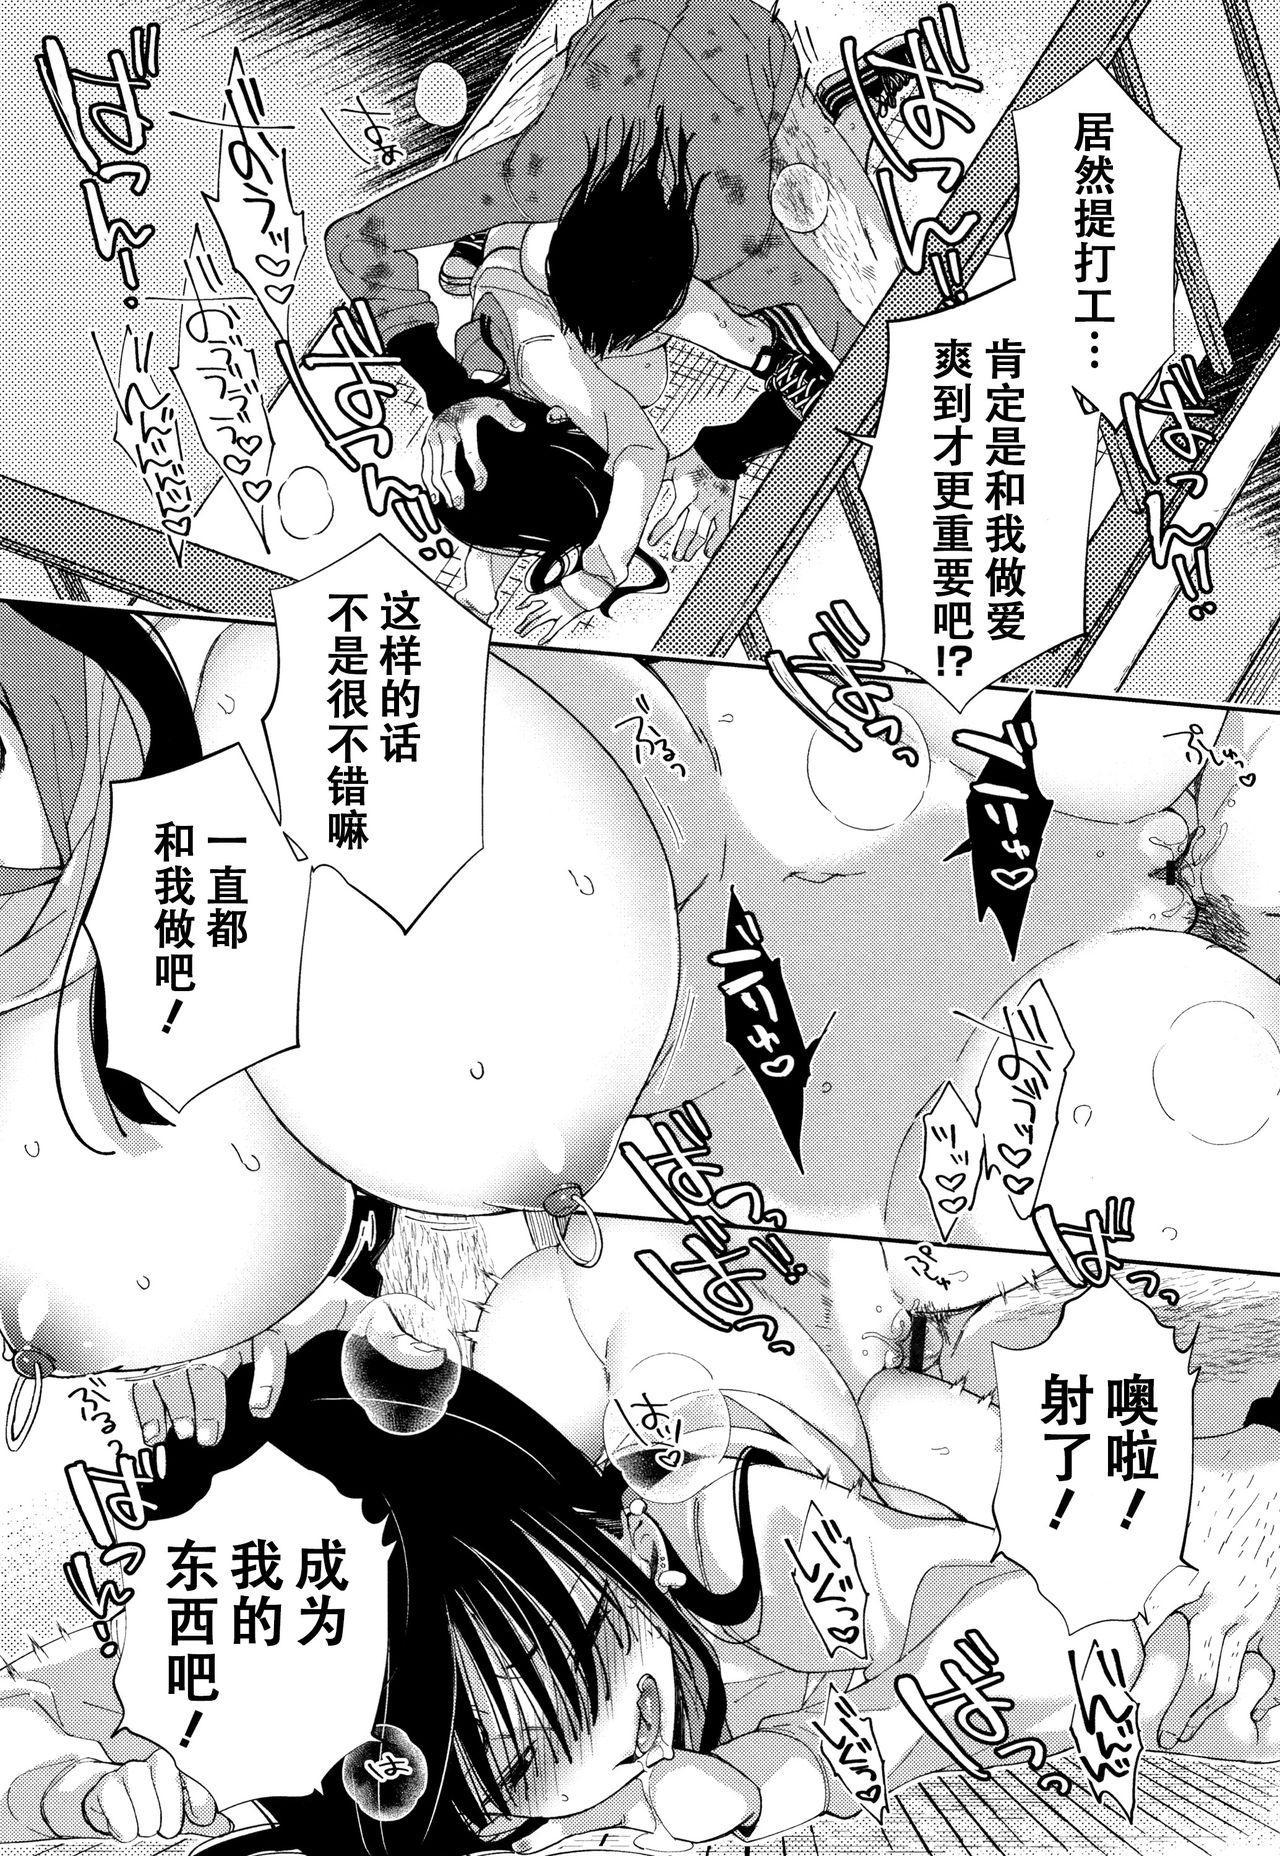 [Achumuchi] Saijaku Gal wa Ikizurai! - The weakest pussy is hard to go.ch.1-3 [Chinese] [战栗的玻璃棒汉化] [Ongoing] 74